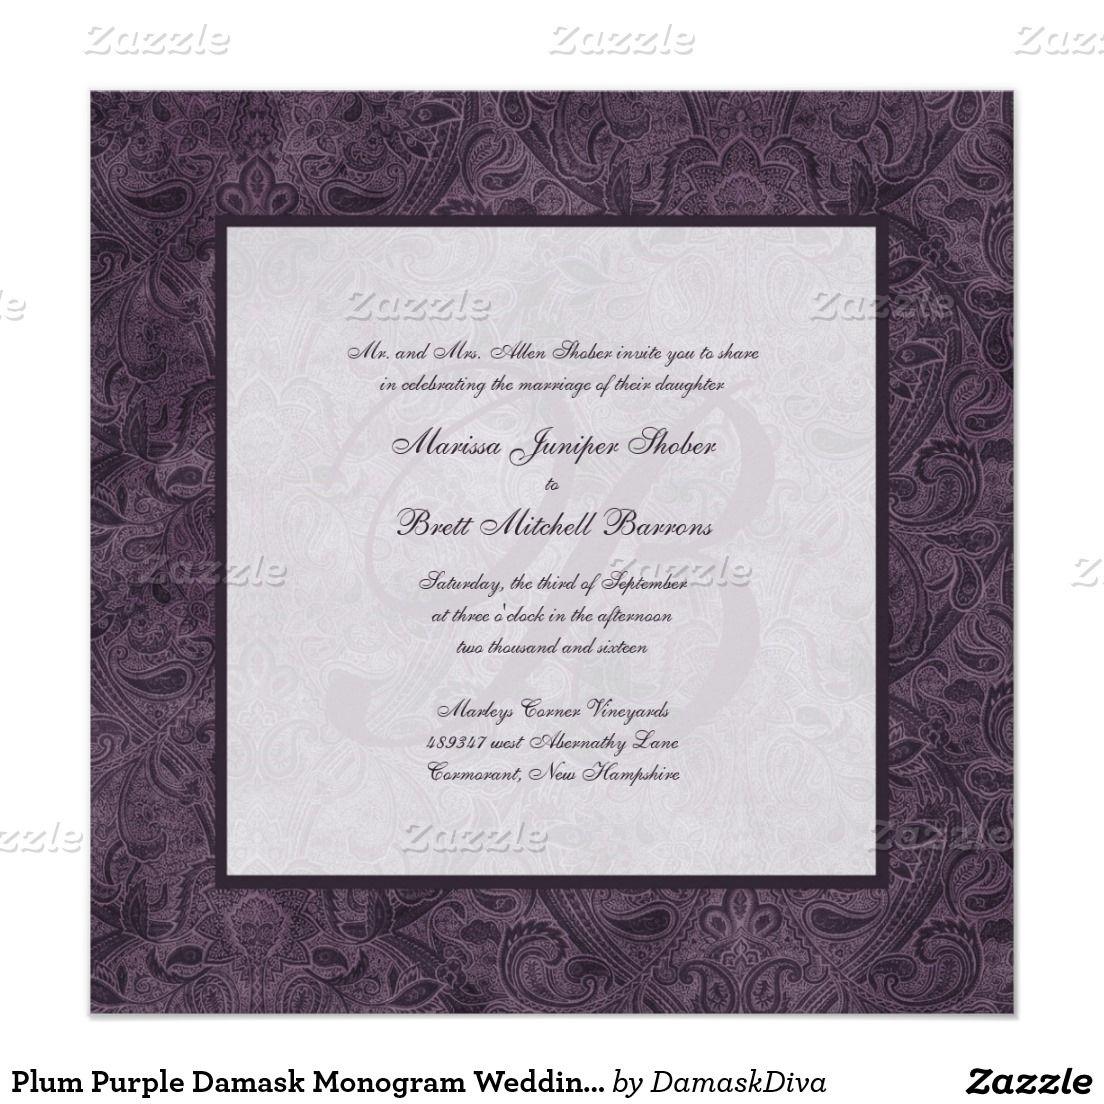 Plum Purple Damask Monogram Wedding Invitations | Damasks, Wedding ...